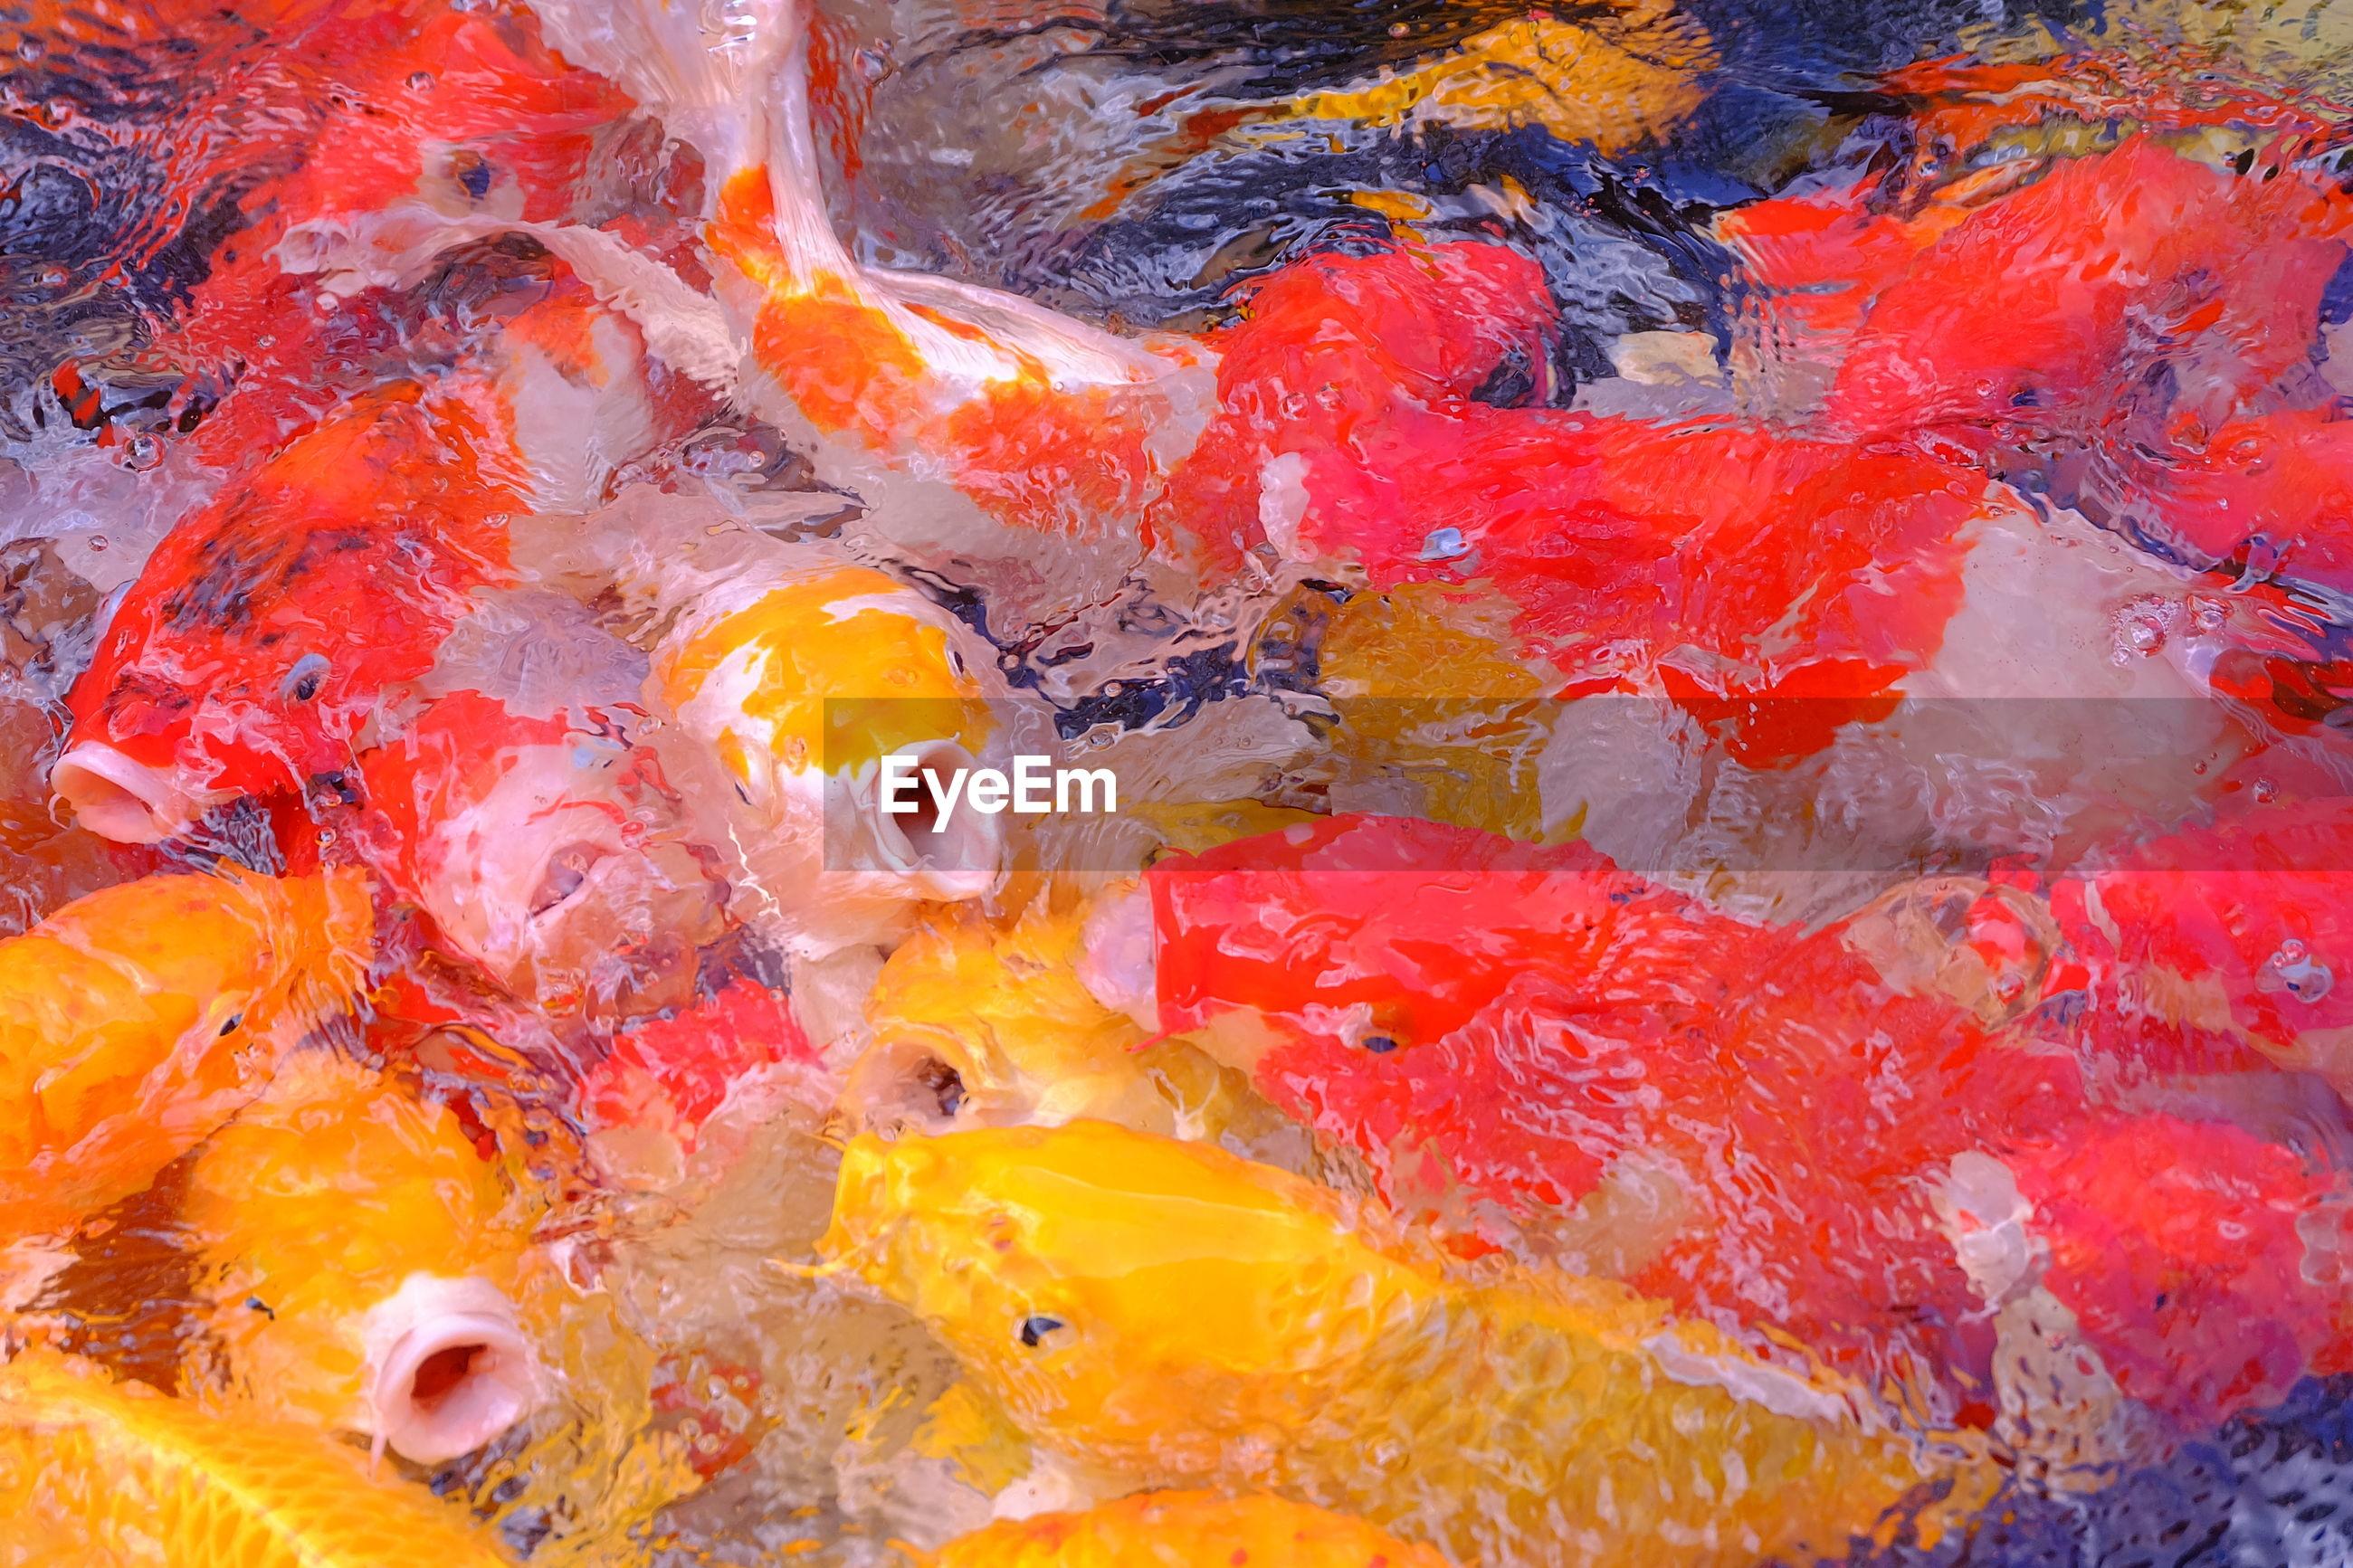 Fancy carp fish in pool